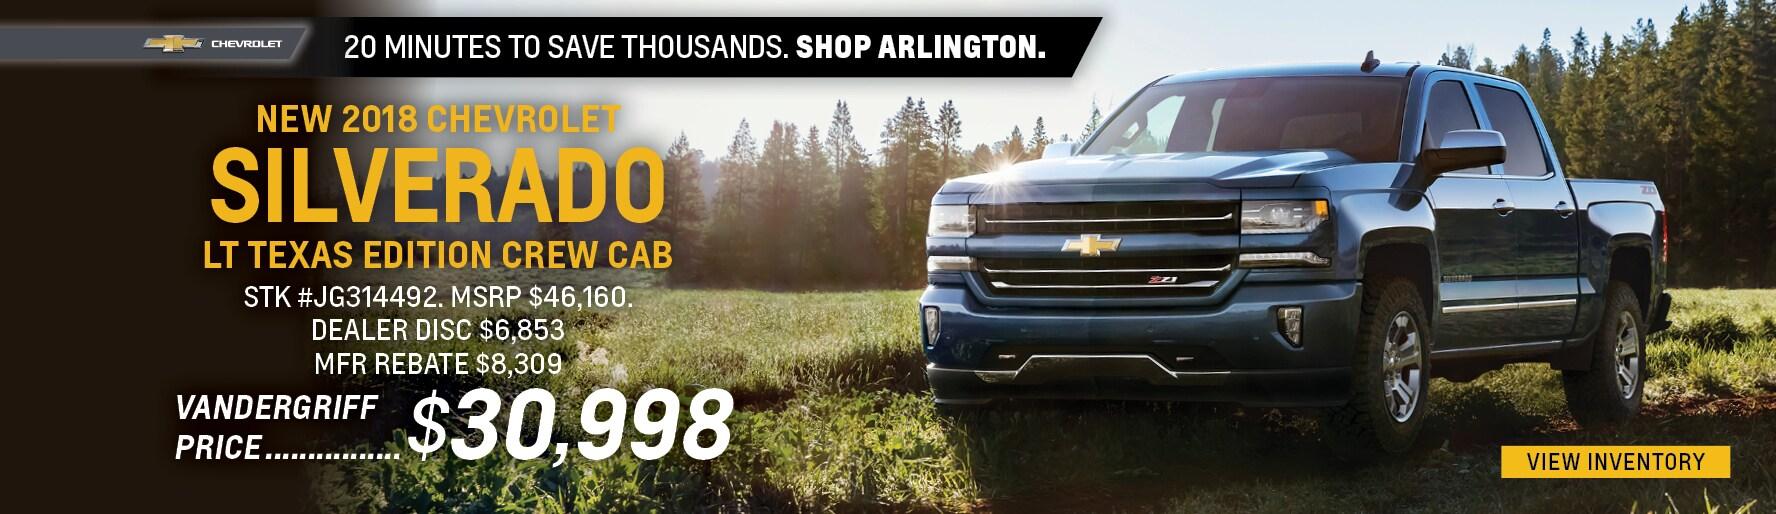 Chevrolet Dealer | New & Used Chevy Cars & Service | Arlington TX